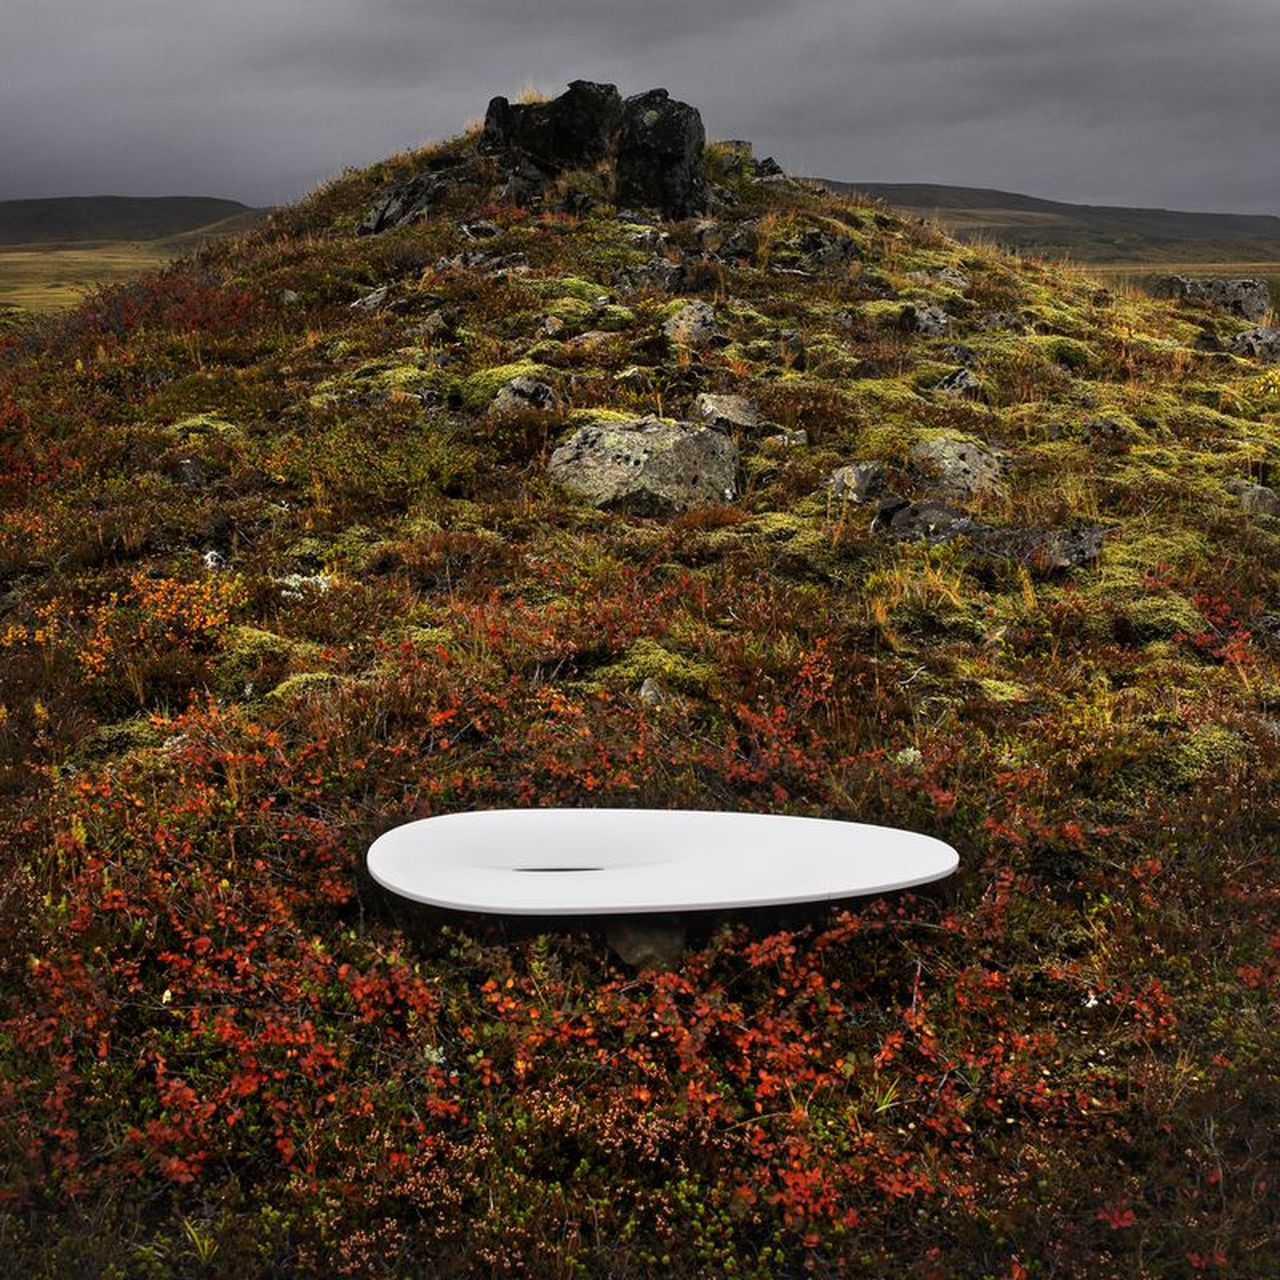 First washbasin in Iceland